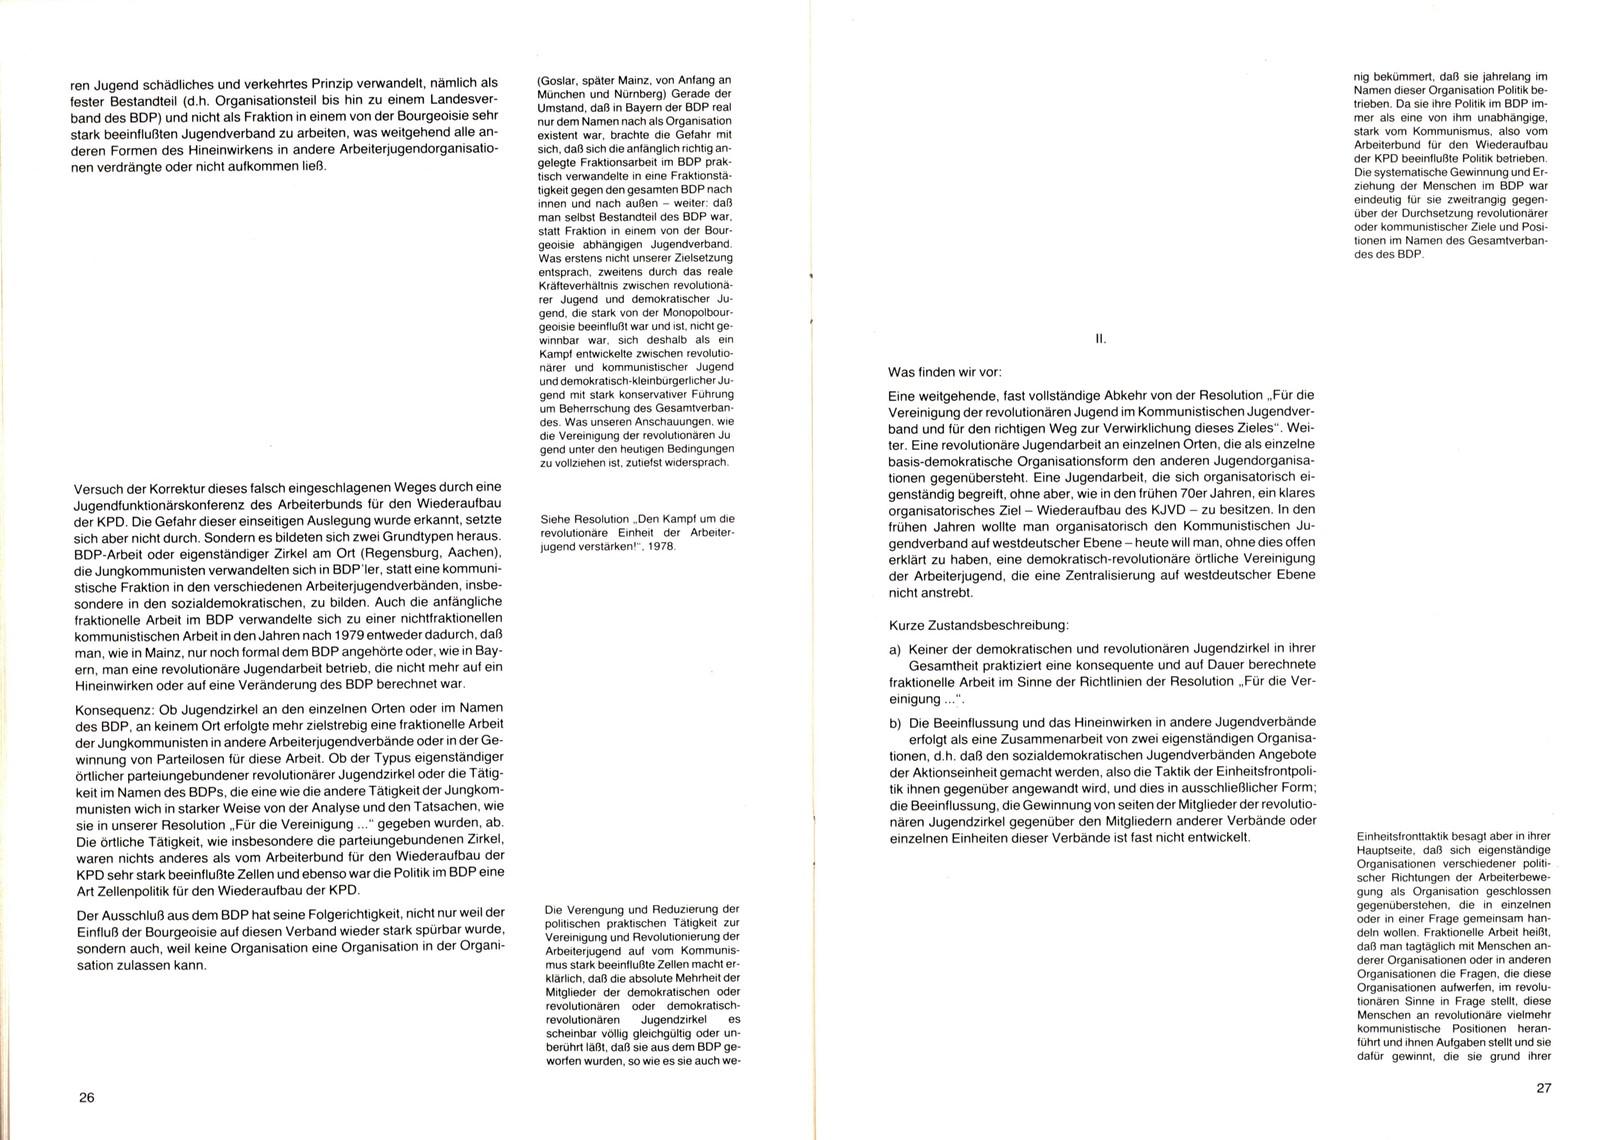 ABG_1985_Beschluesse_IV_Delegiertenkonferenz_15